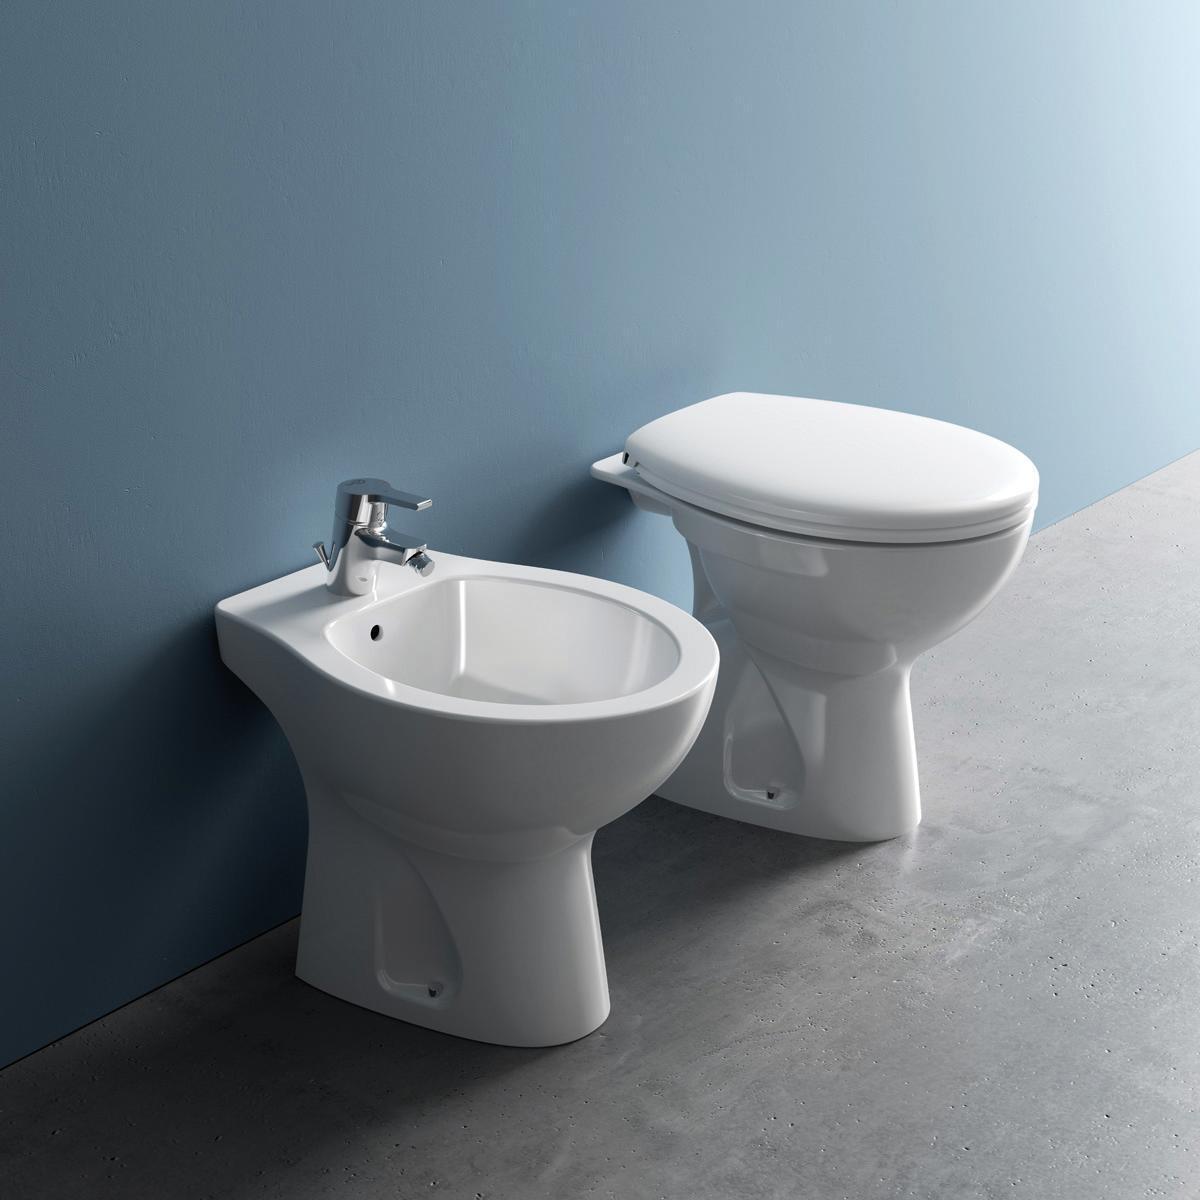 Coppia sanitari pavimento distanziato Miky New IDEAL STANDARD - 1